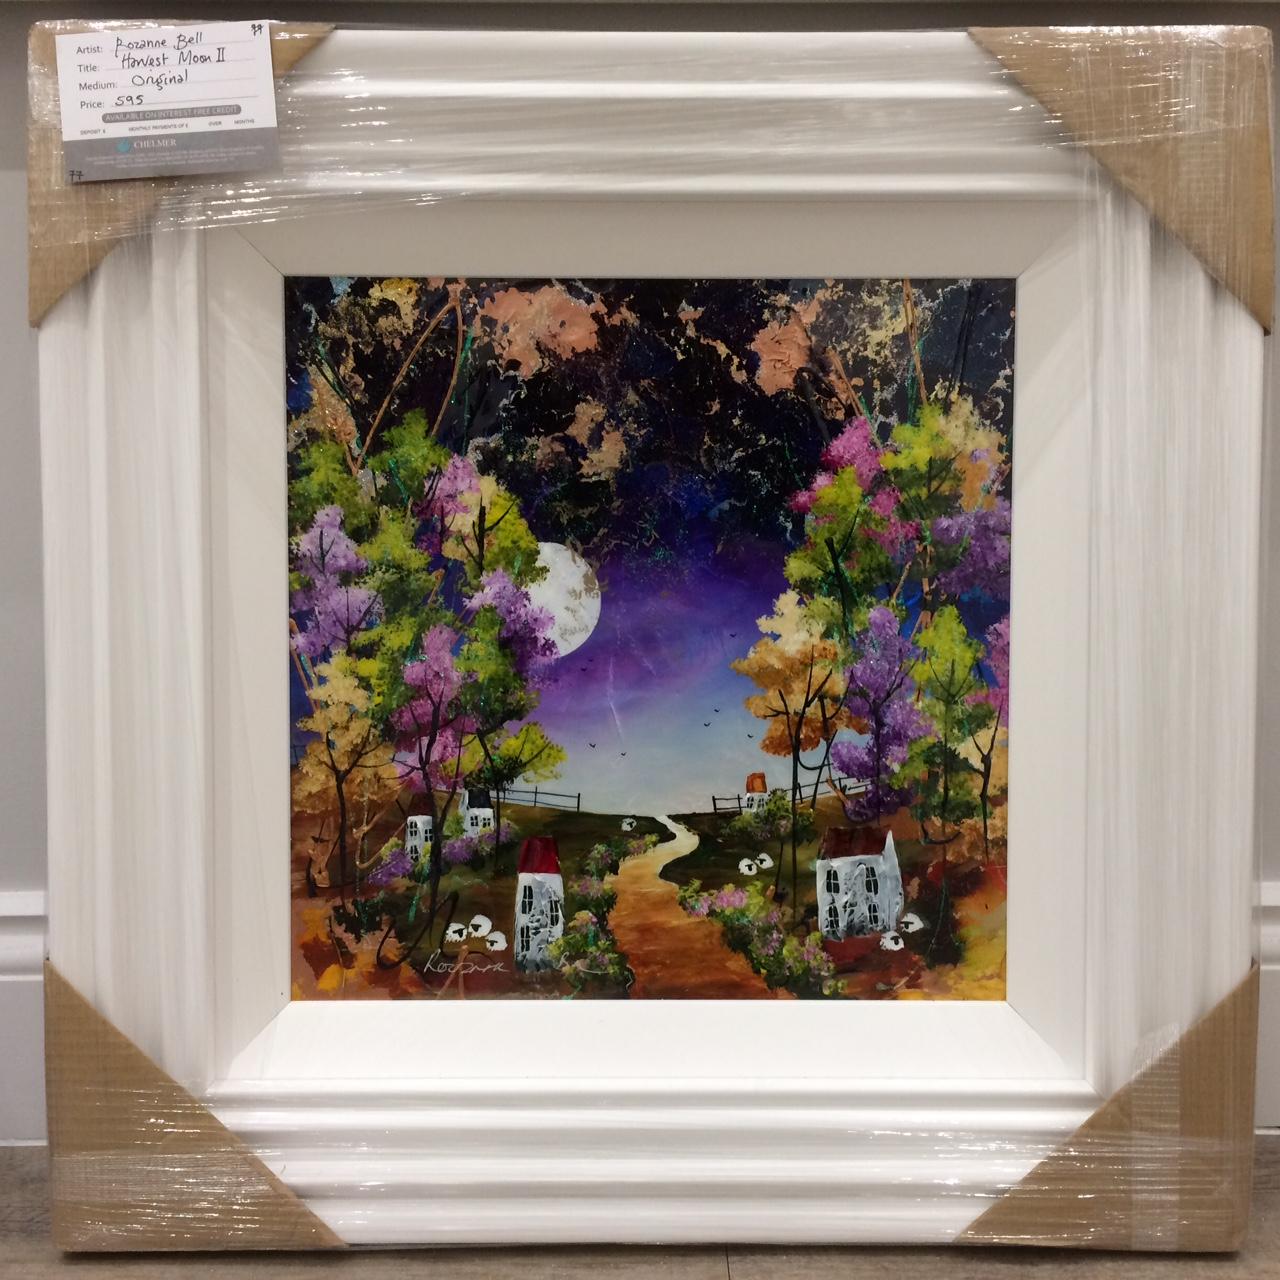 Harvest Moon II (16 x 16) by Rozanne Bell